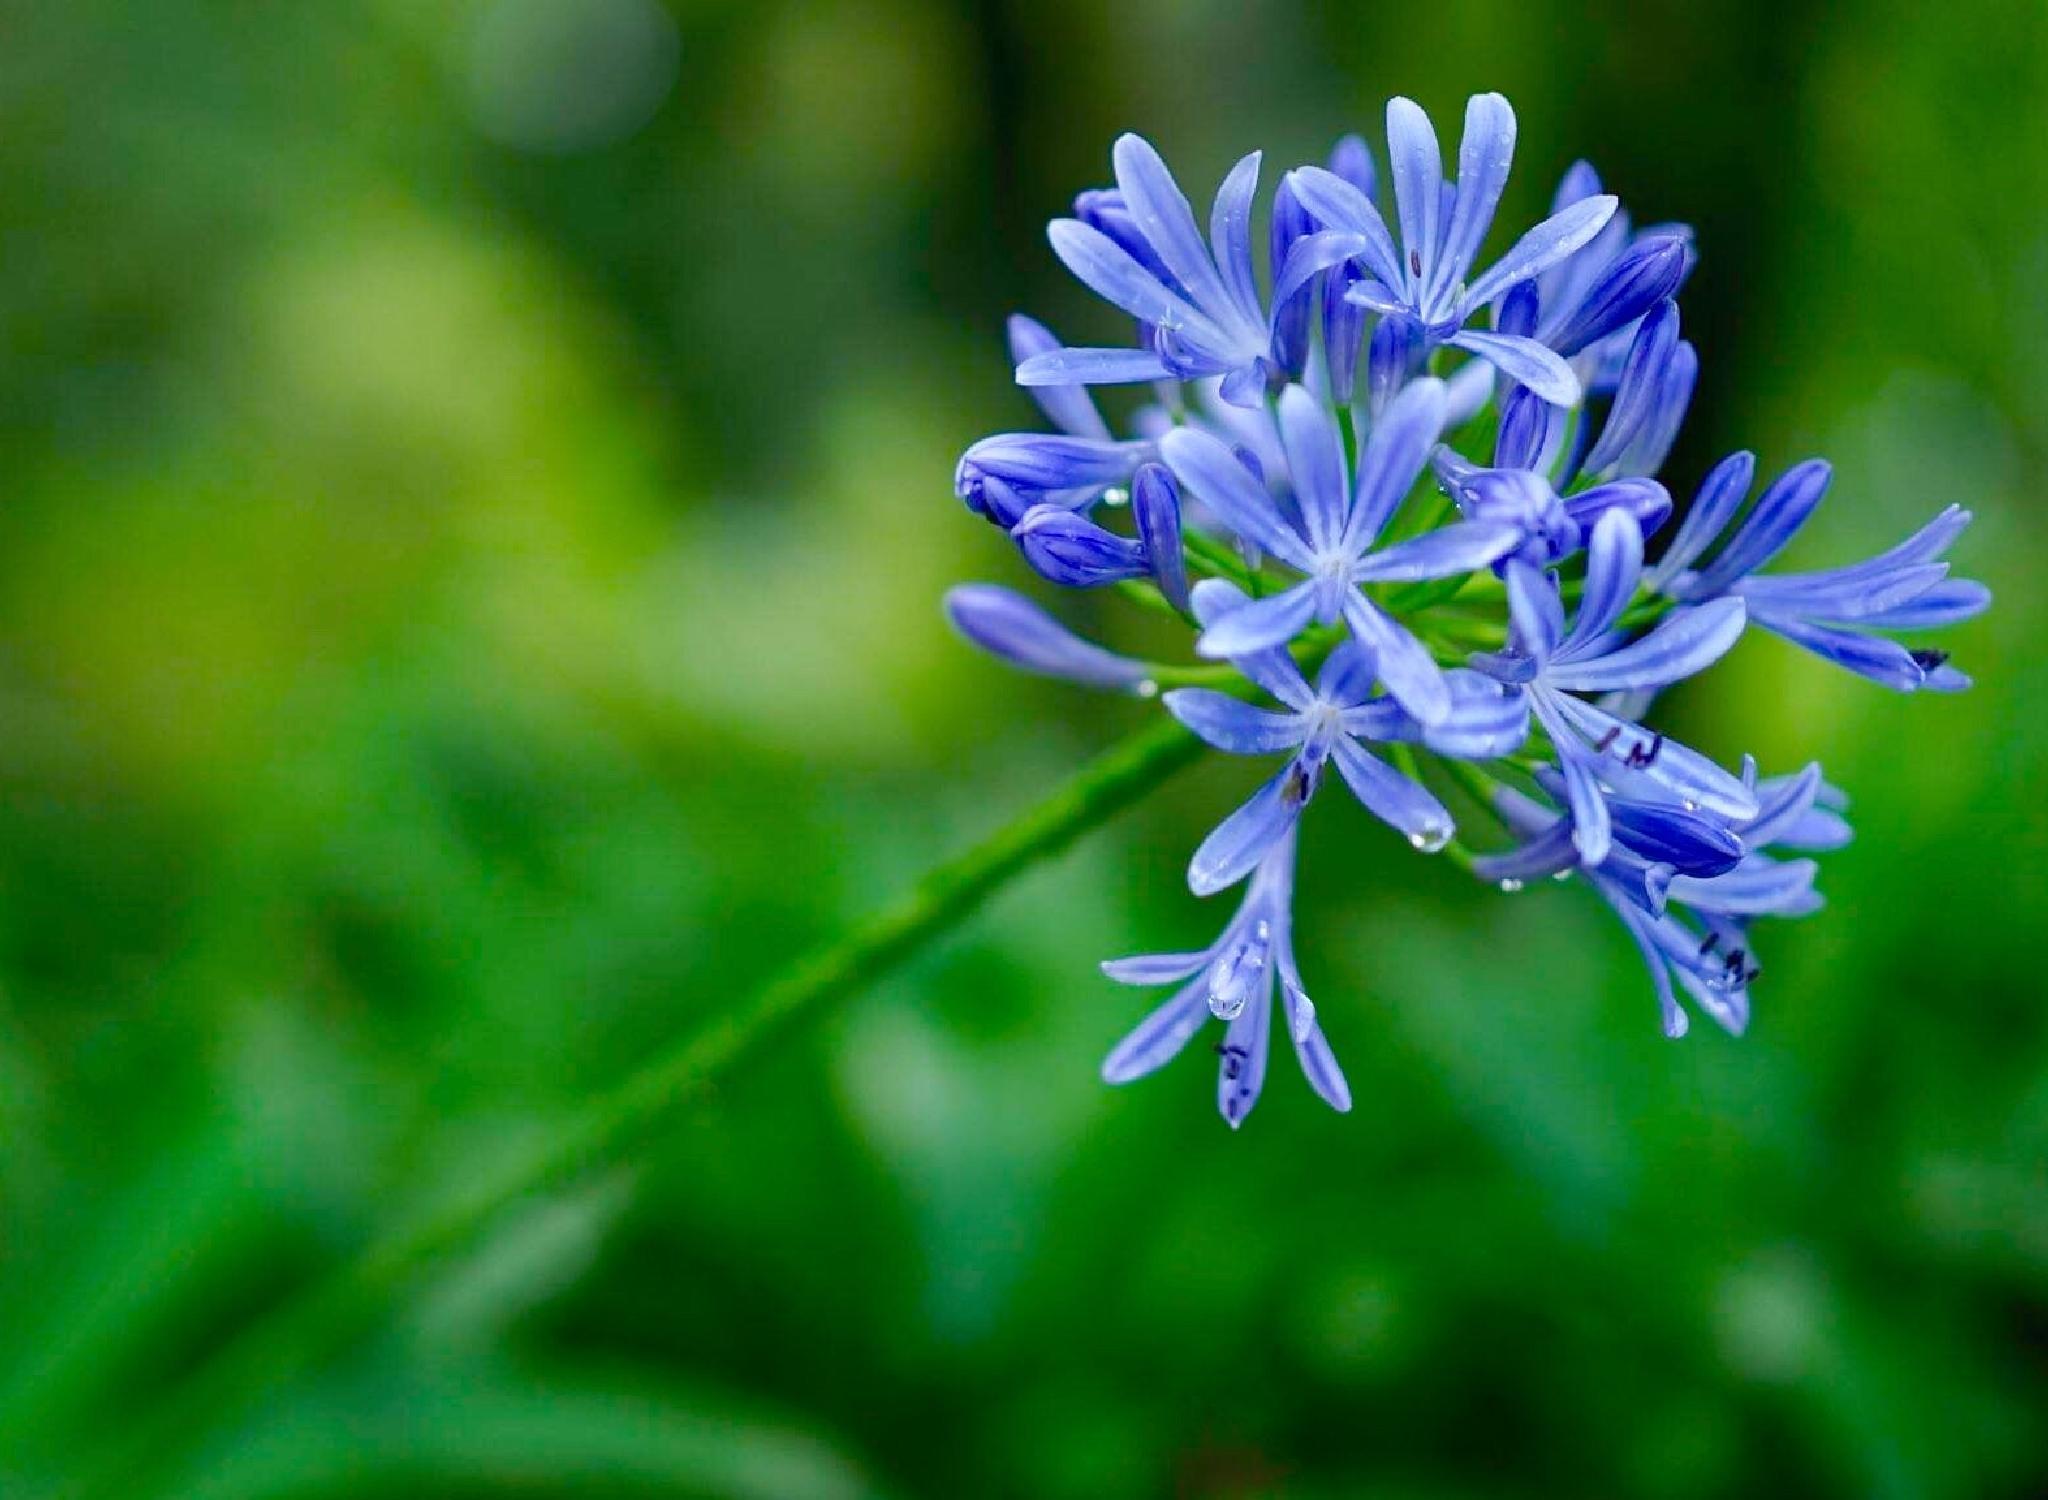 Blue Blooming by philip.han